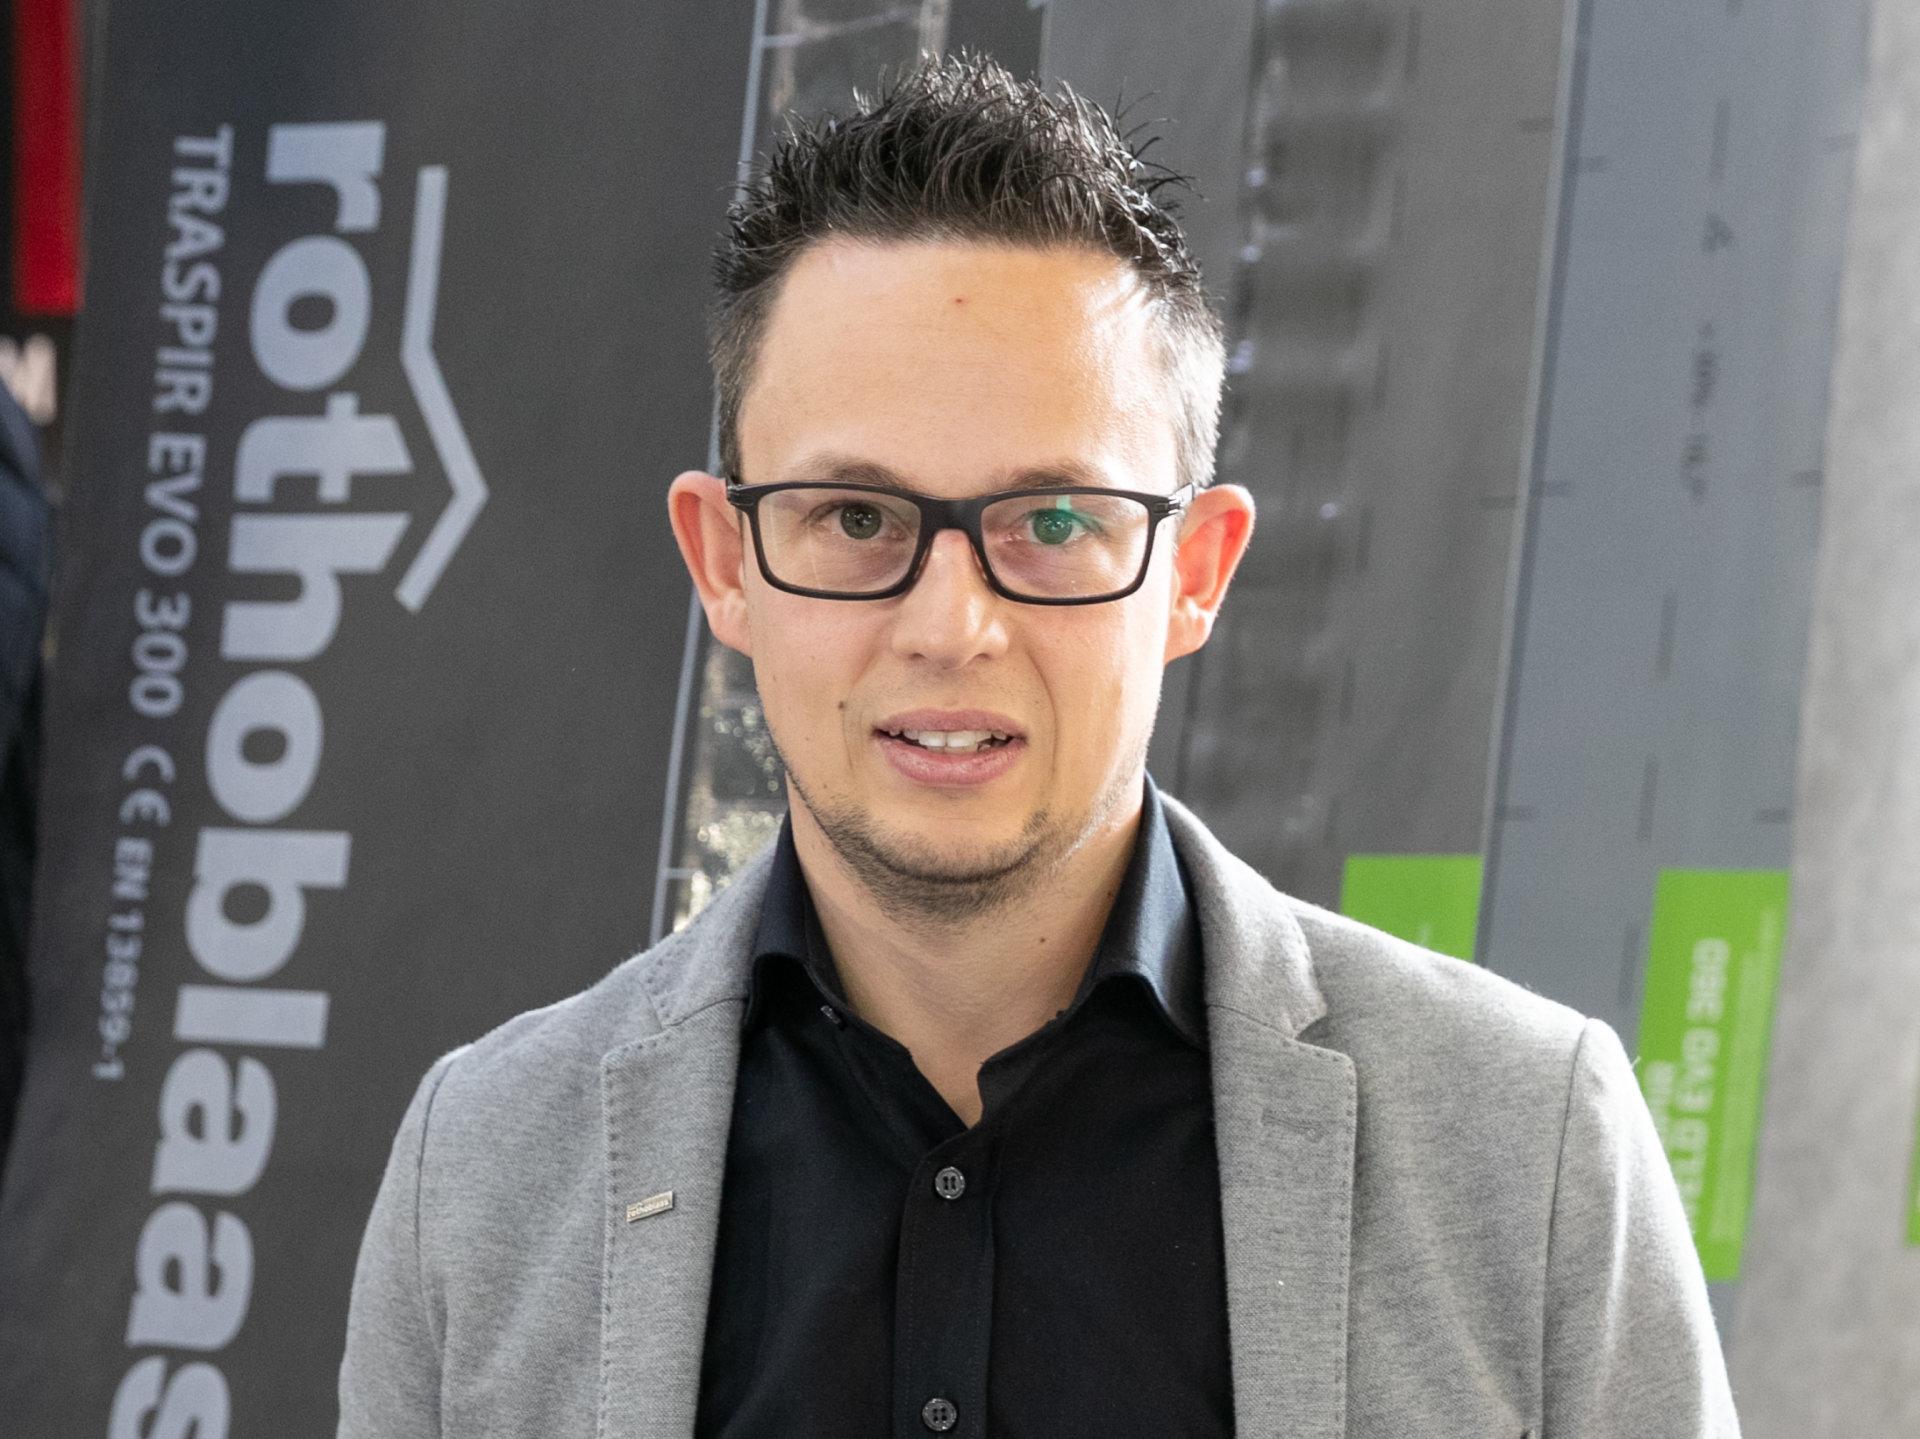 Christian Tomasini - Rothoblaas